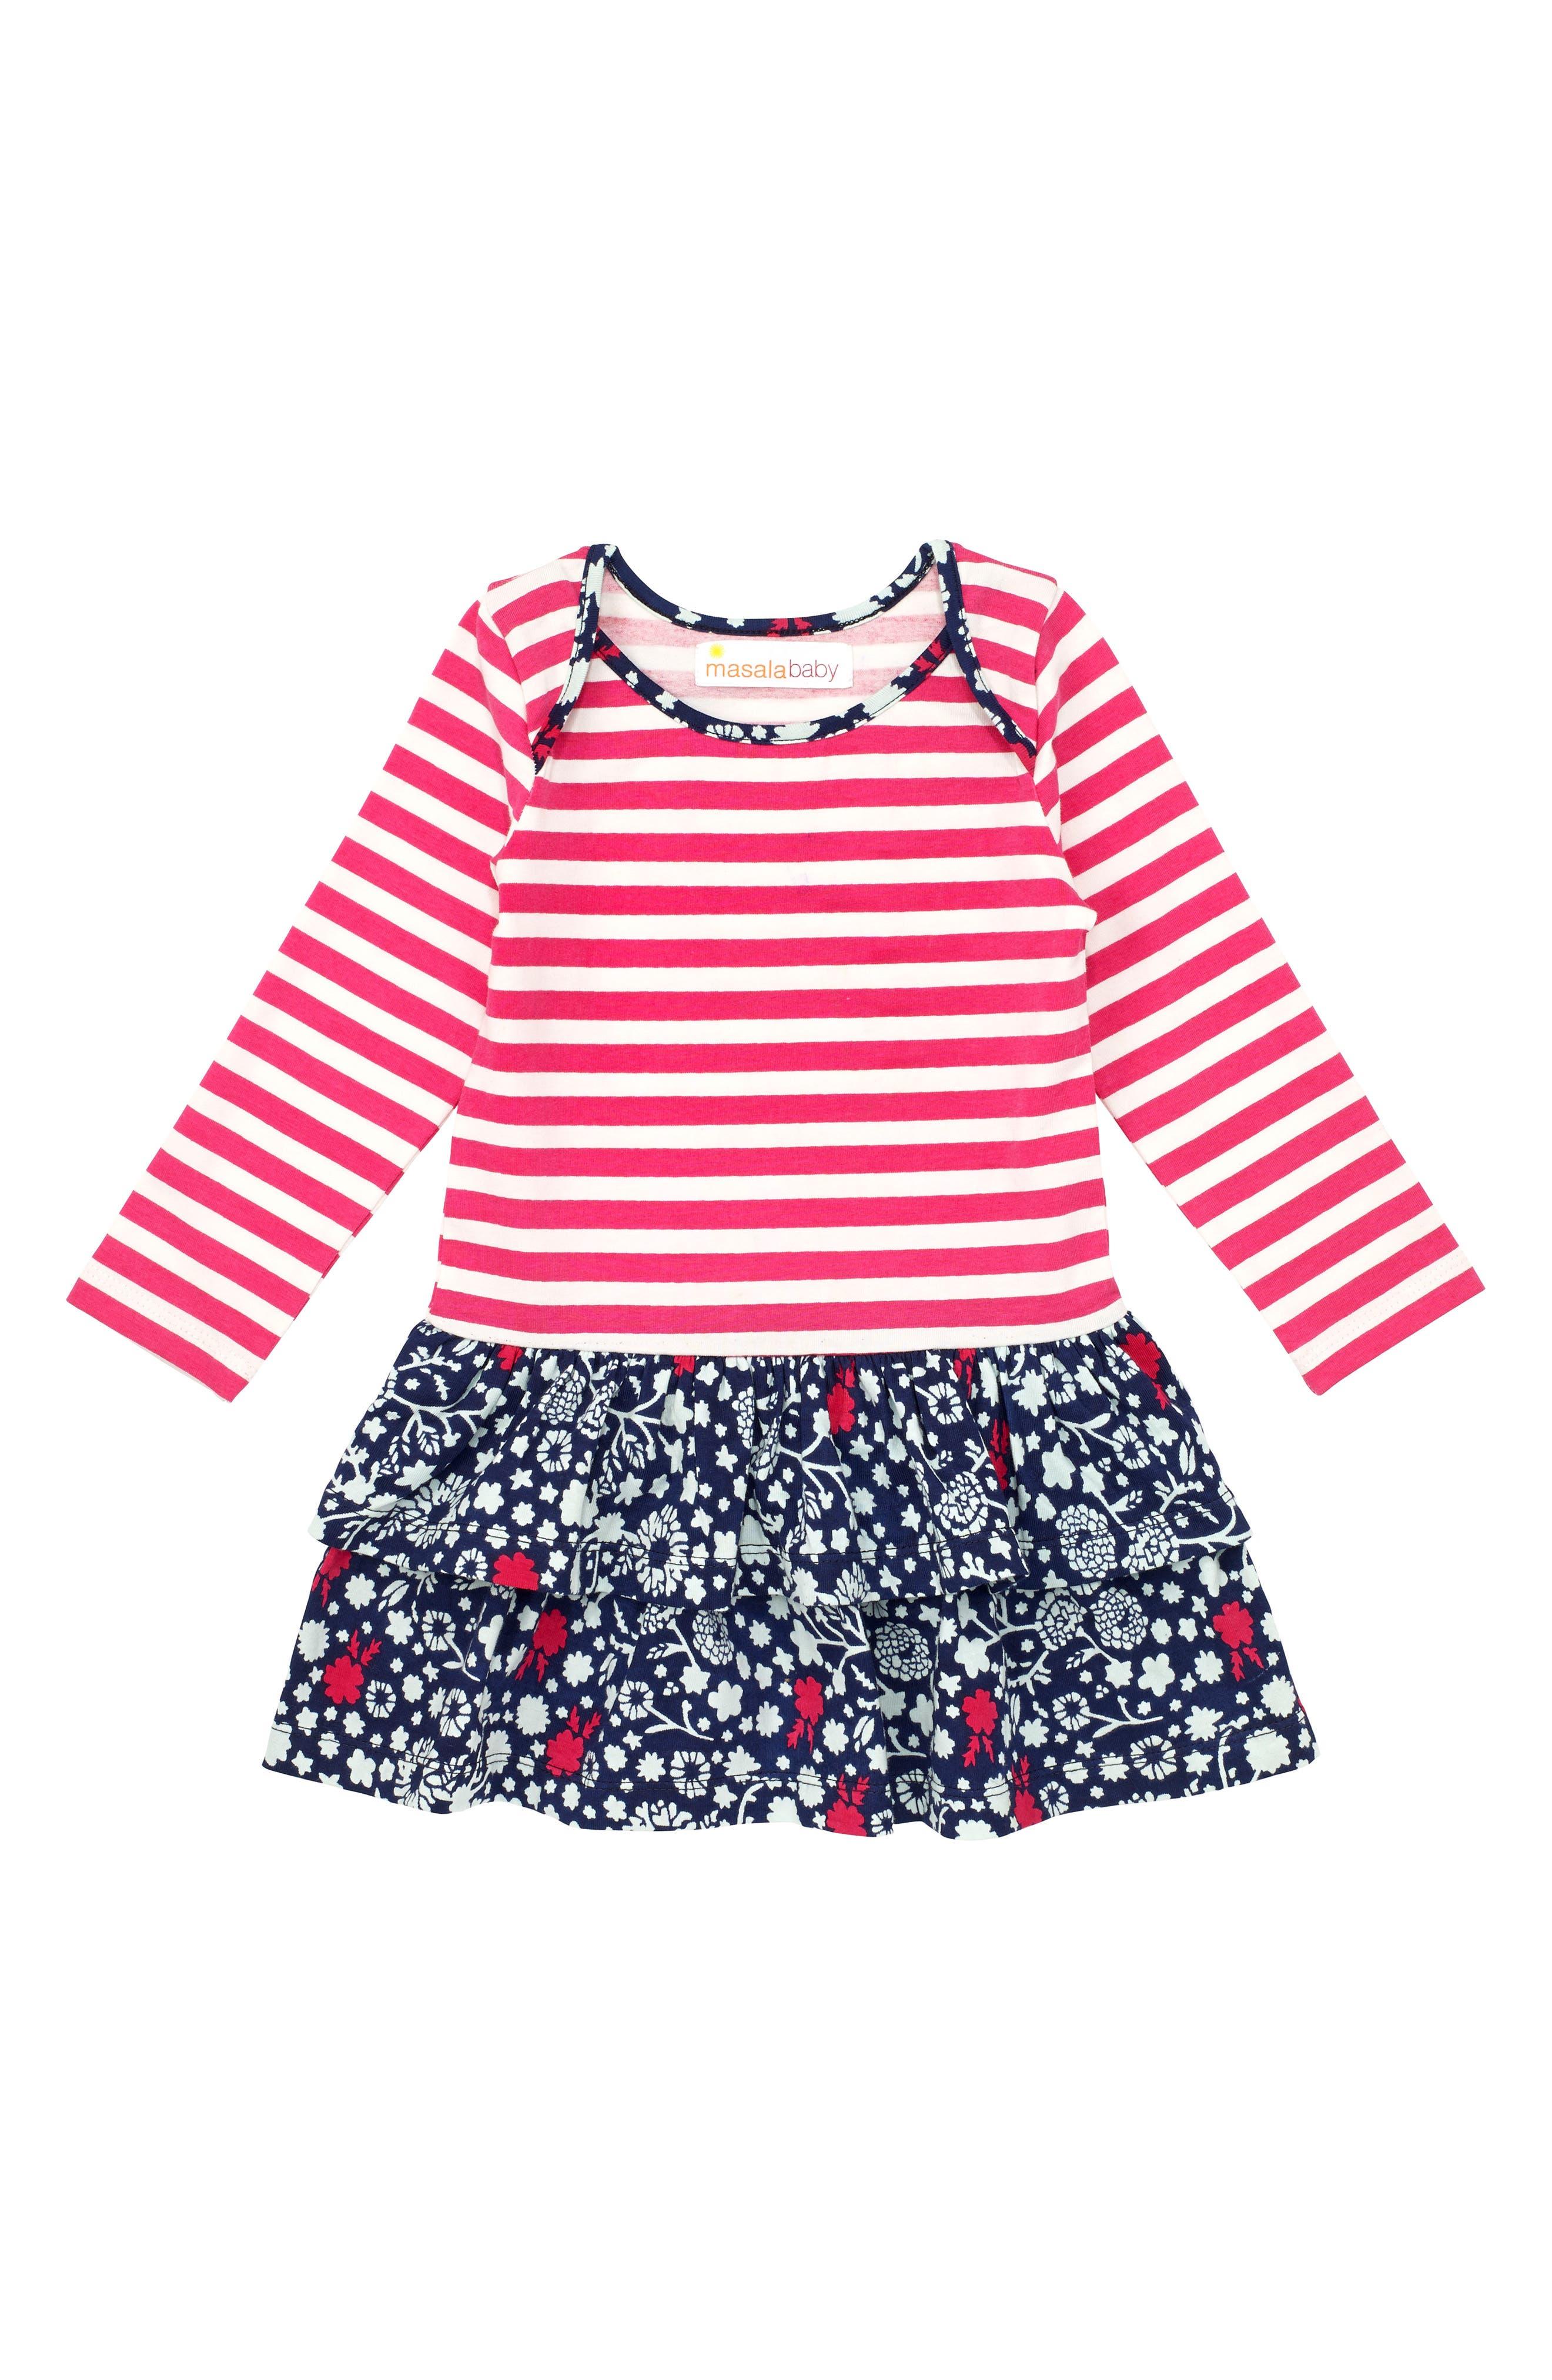 Main Image - Masala Baby Belle Organic Cotton Dress (Baby Girls)